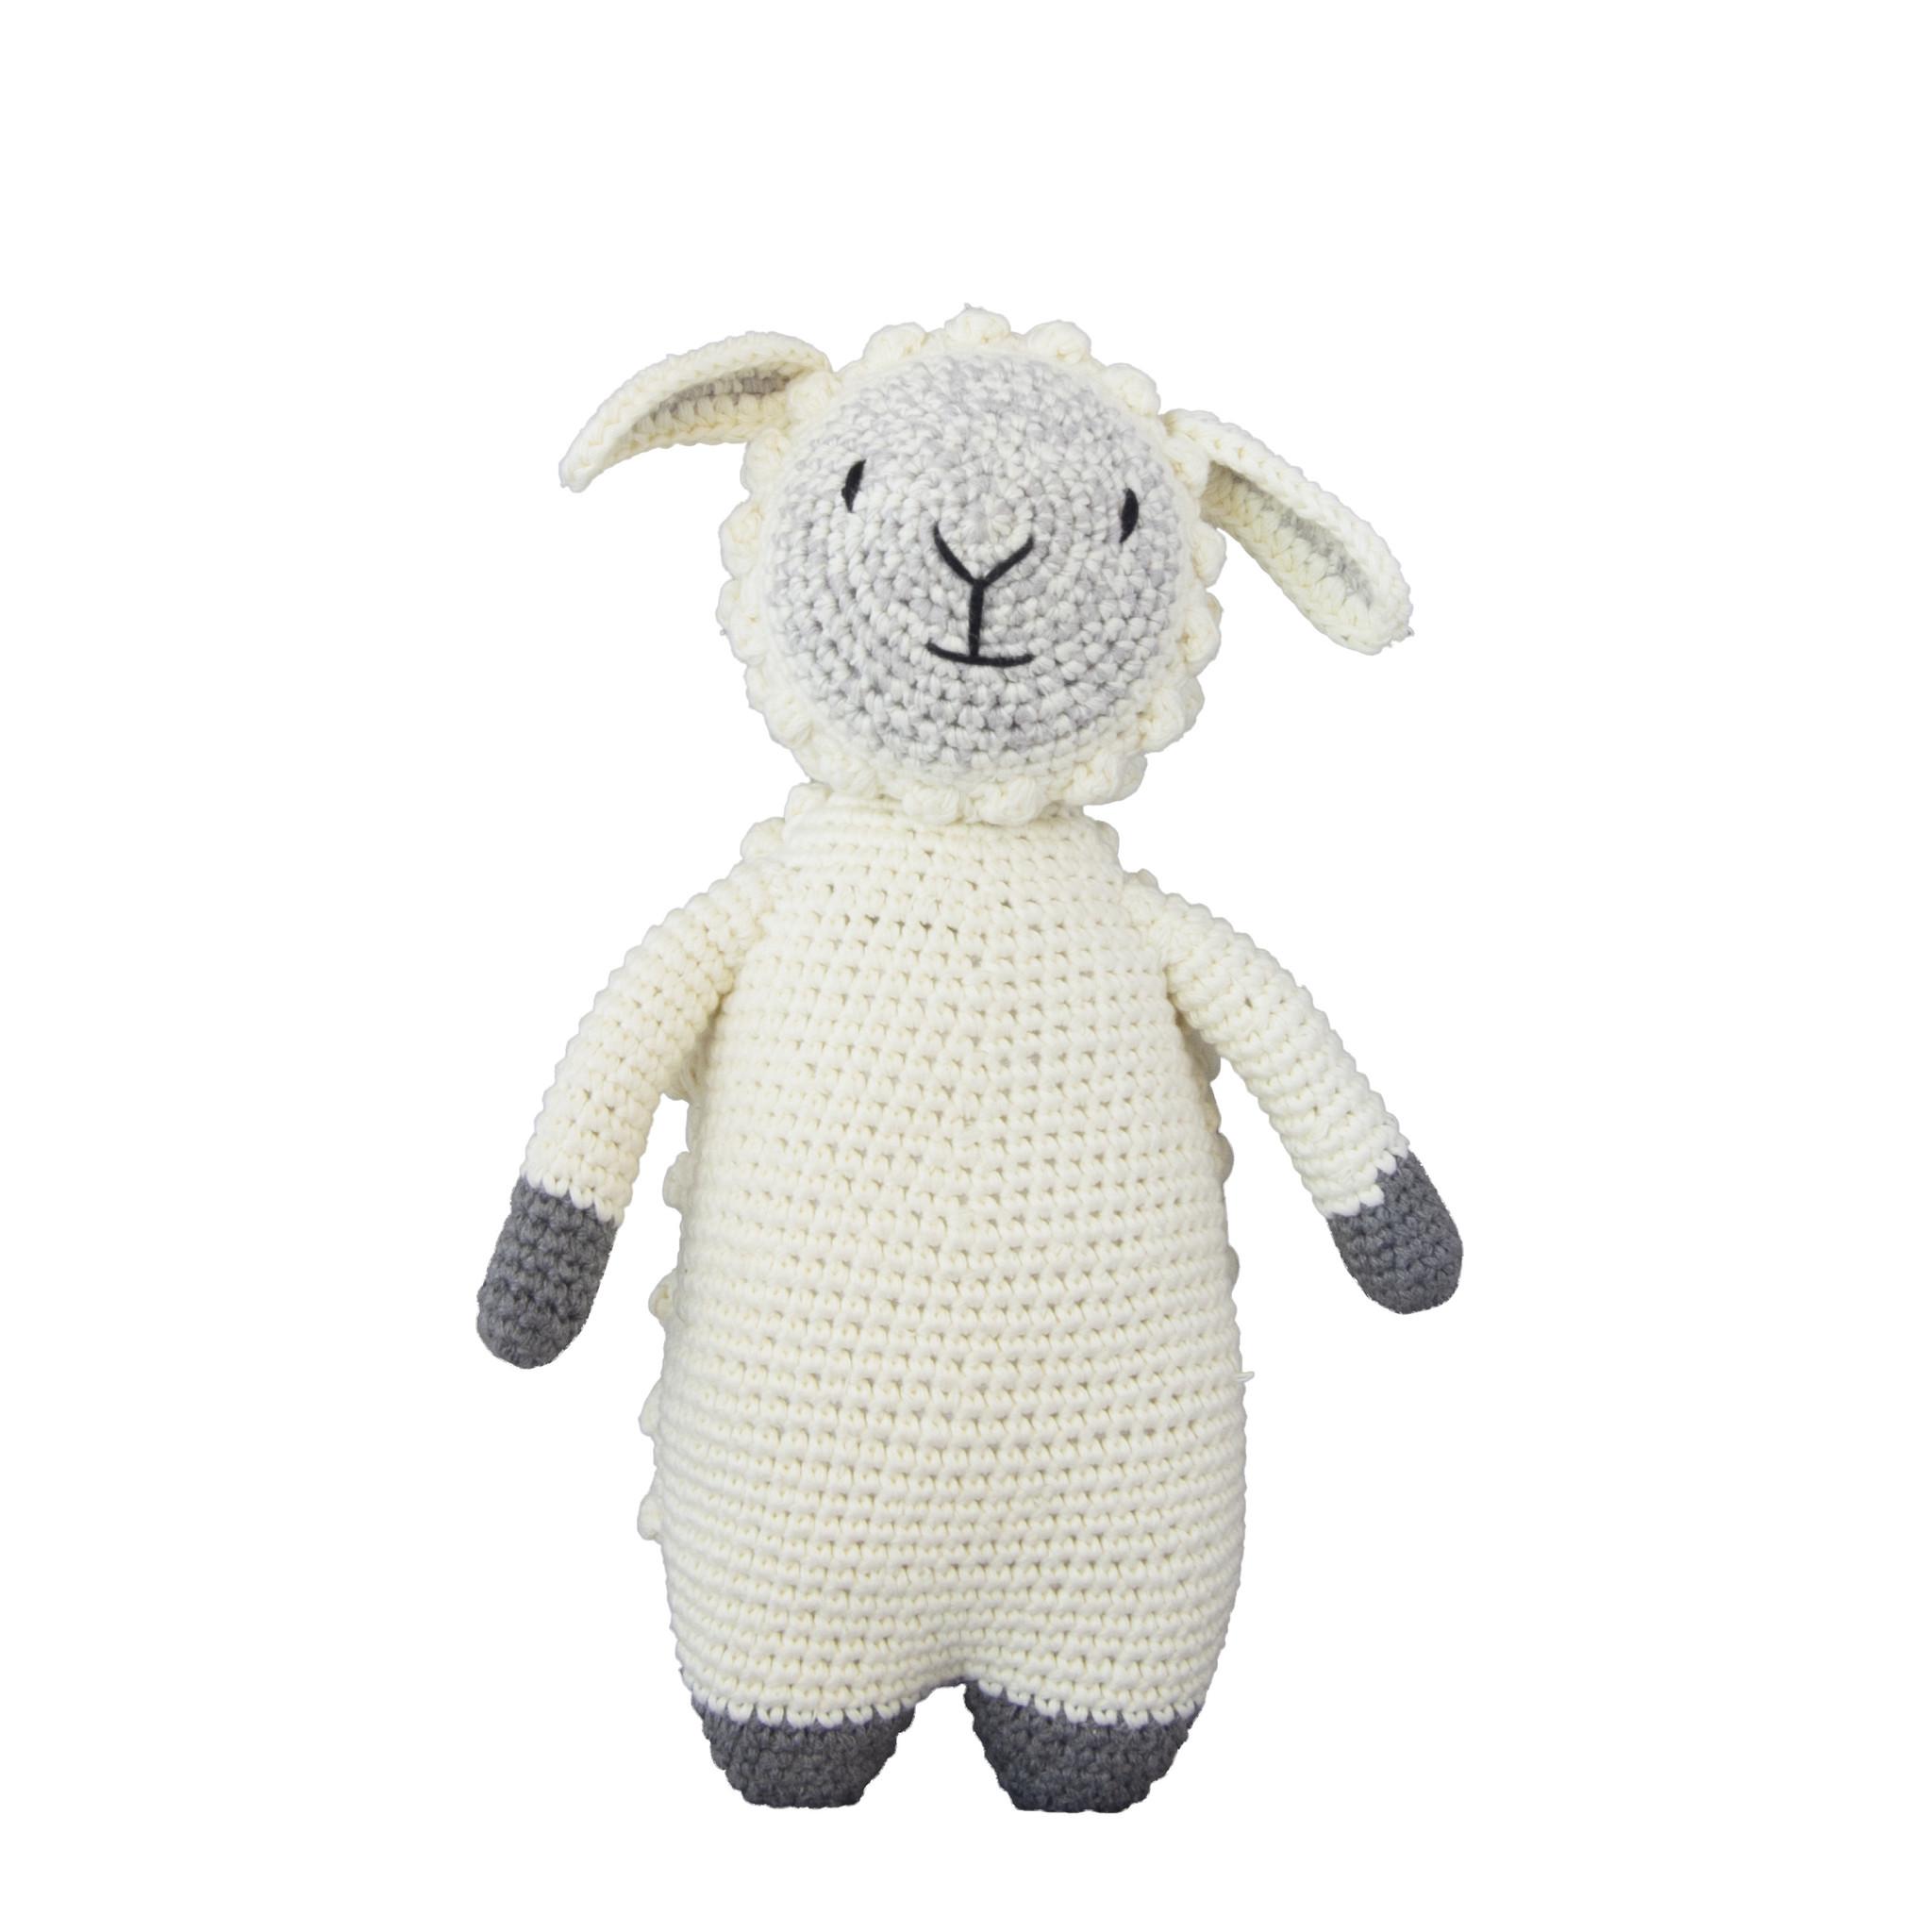 Crochet doll Woodland Sheep